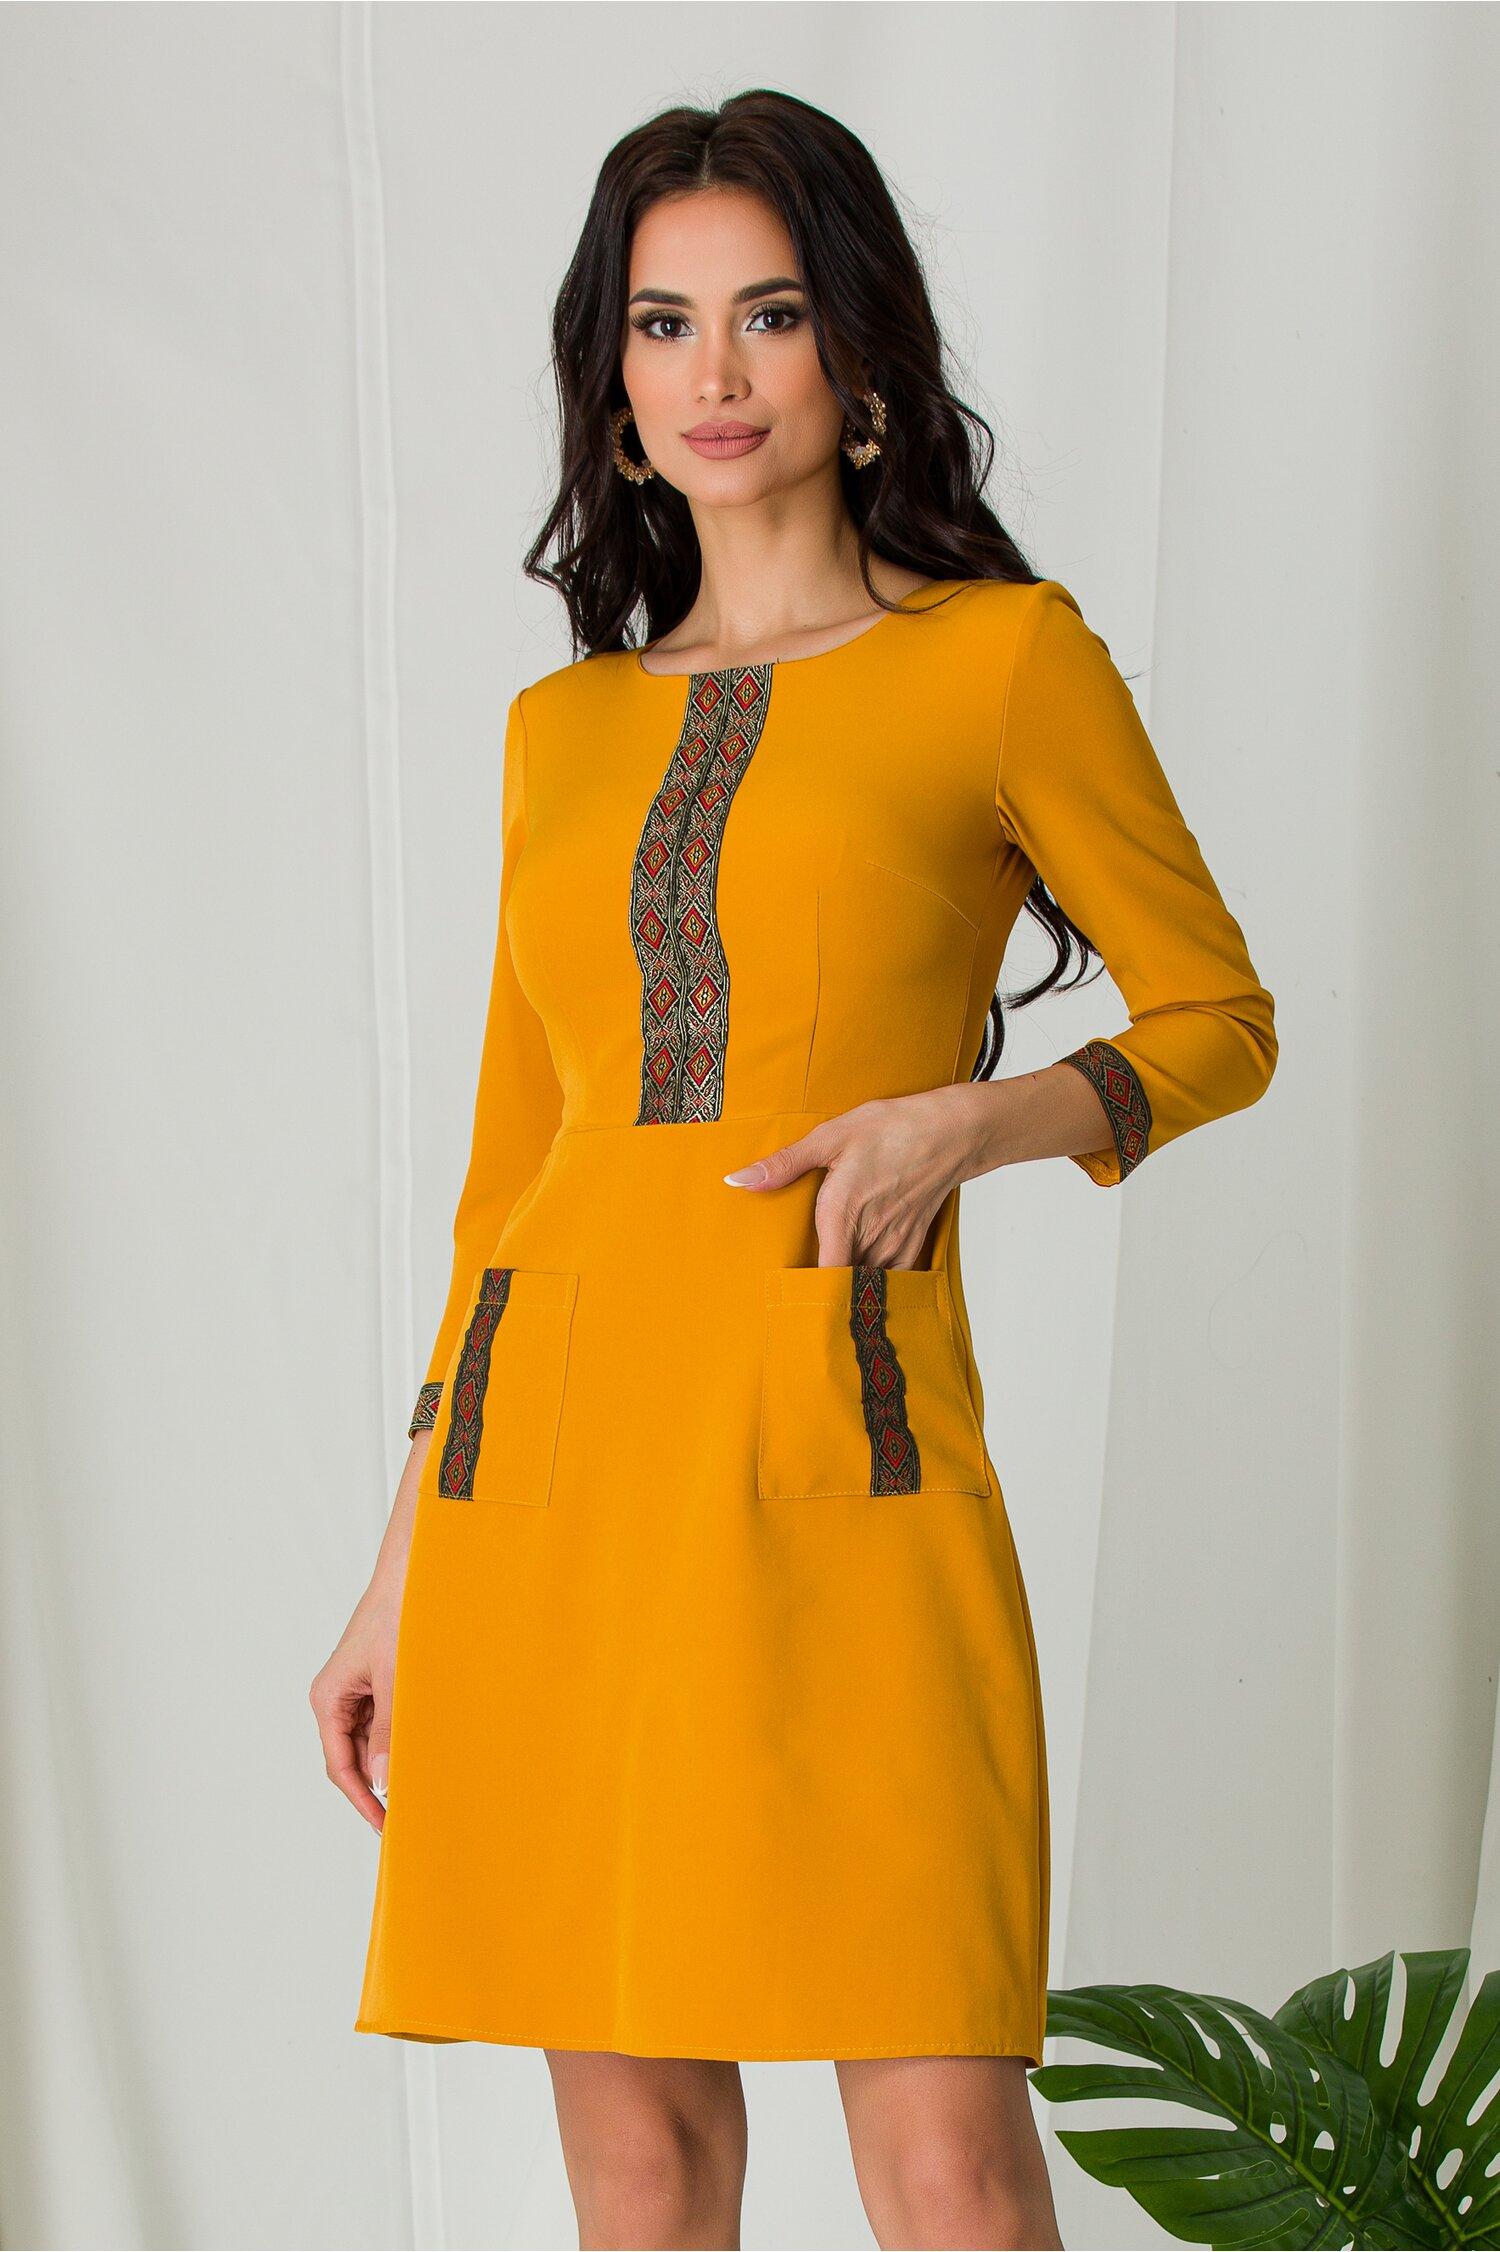 Rochie Ella Collection Ilinca galben mustar cu benzi decorative